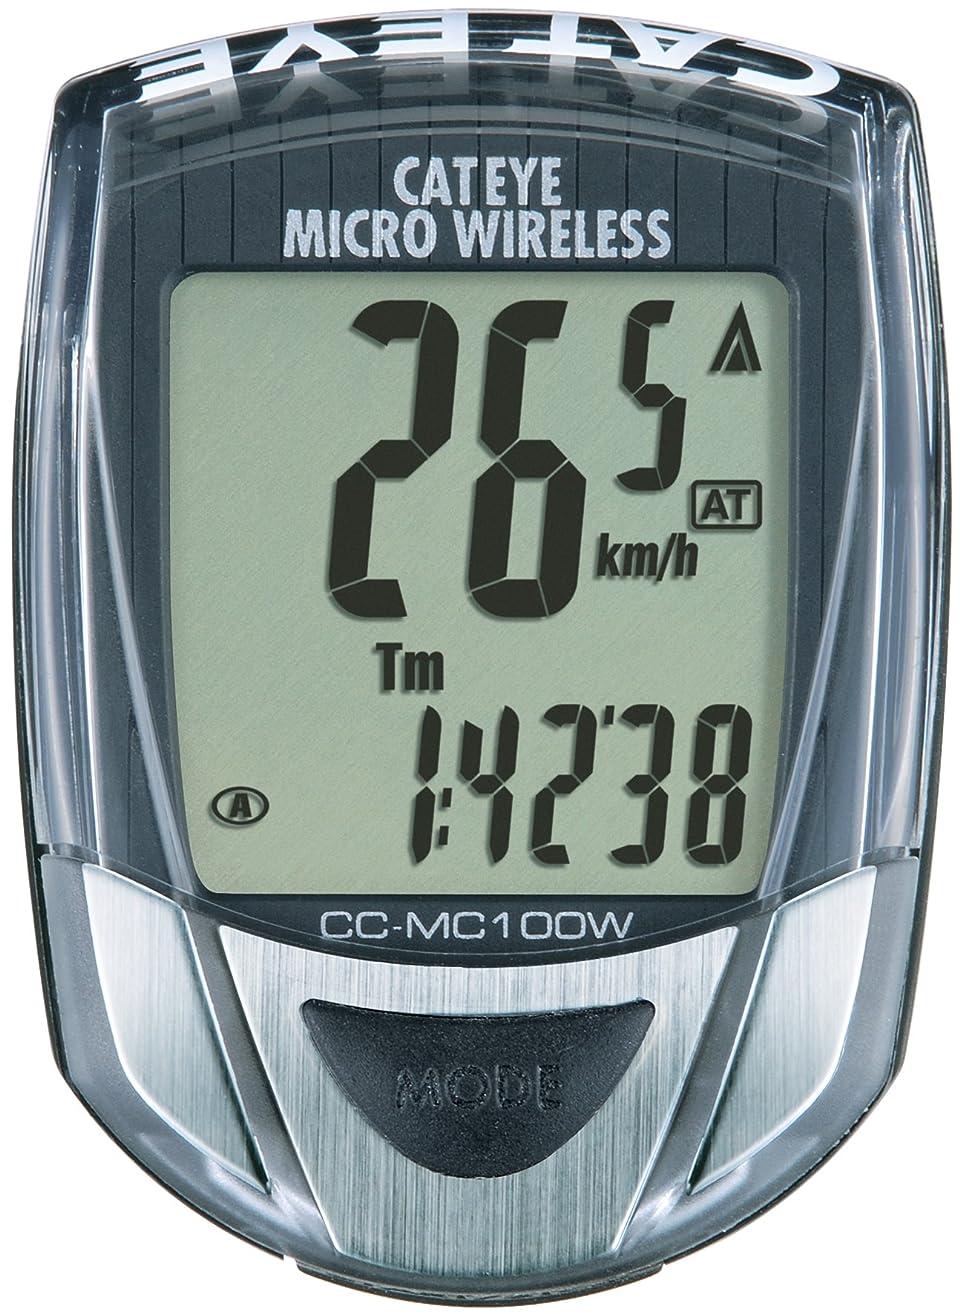 CatEye Micro Wireless Cyclocomputer